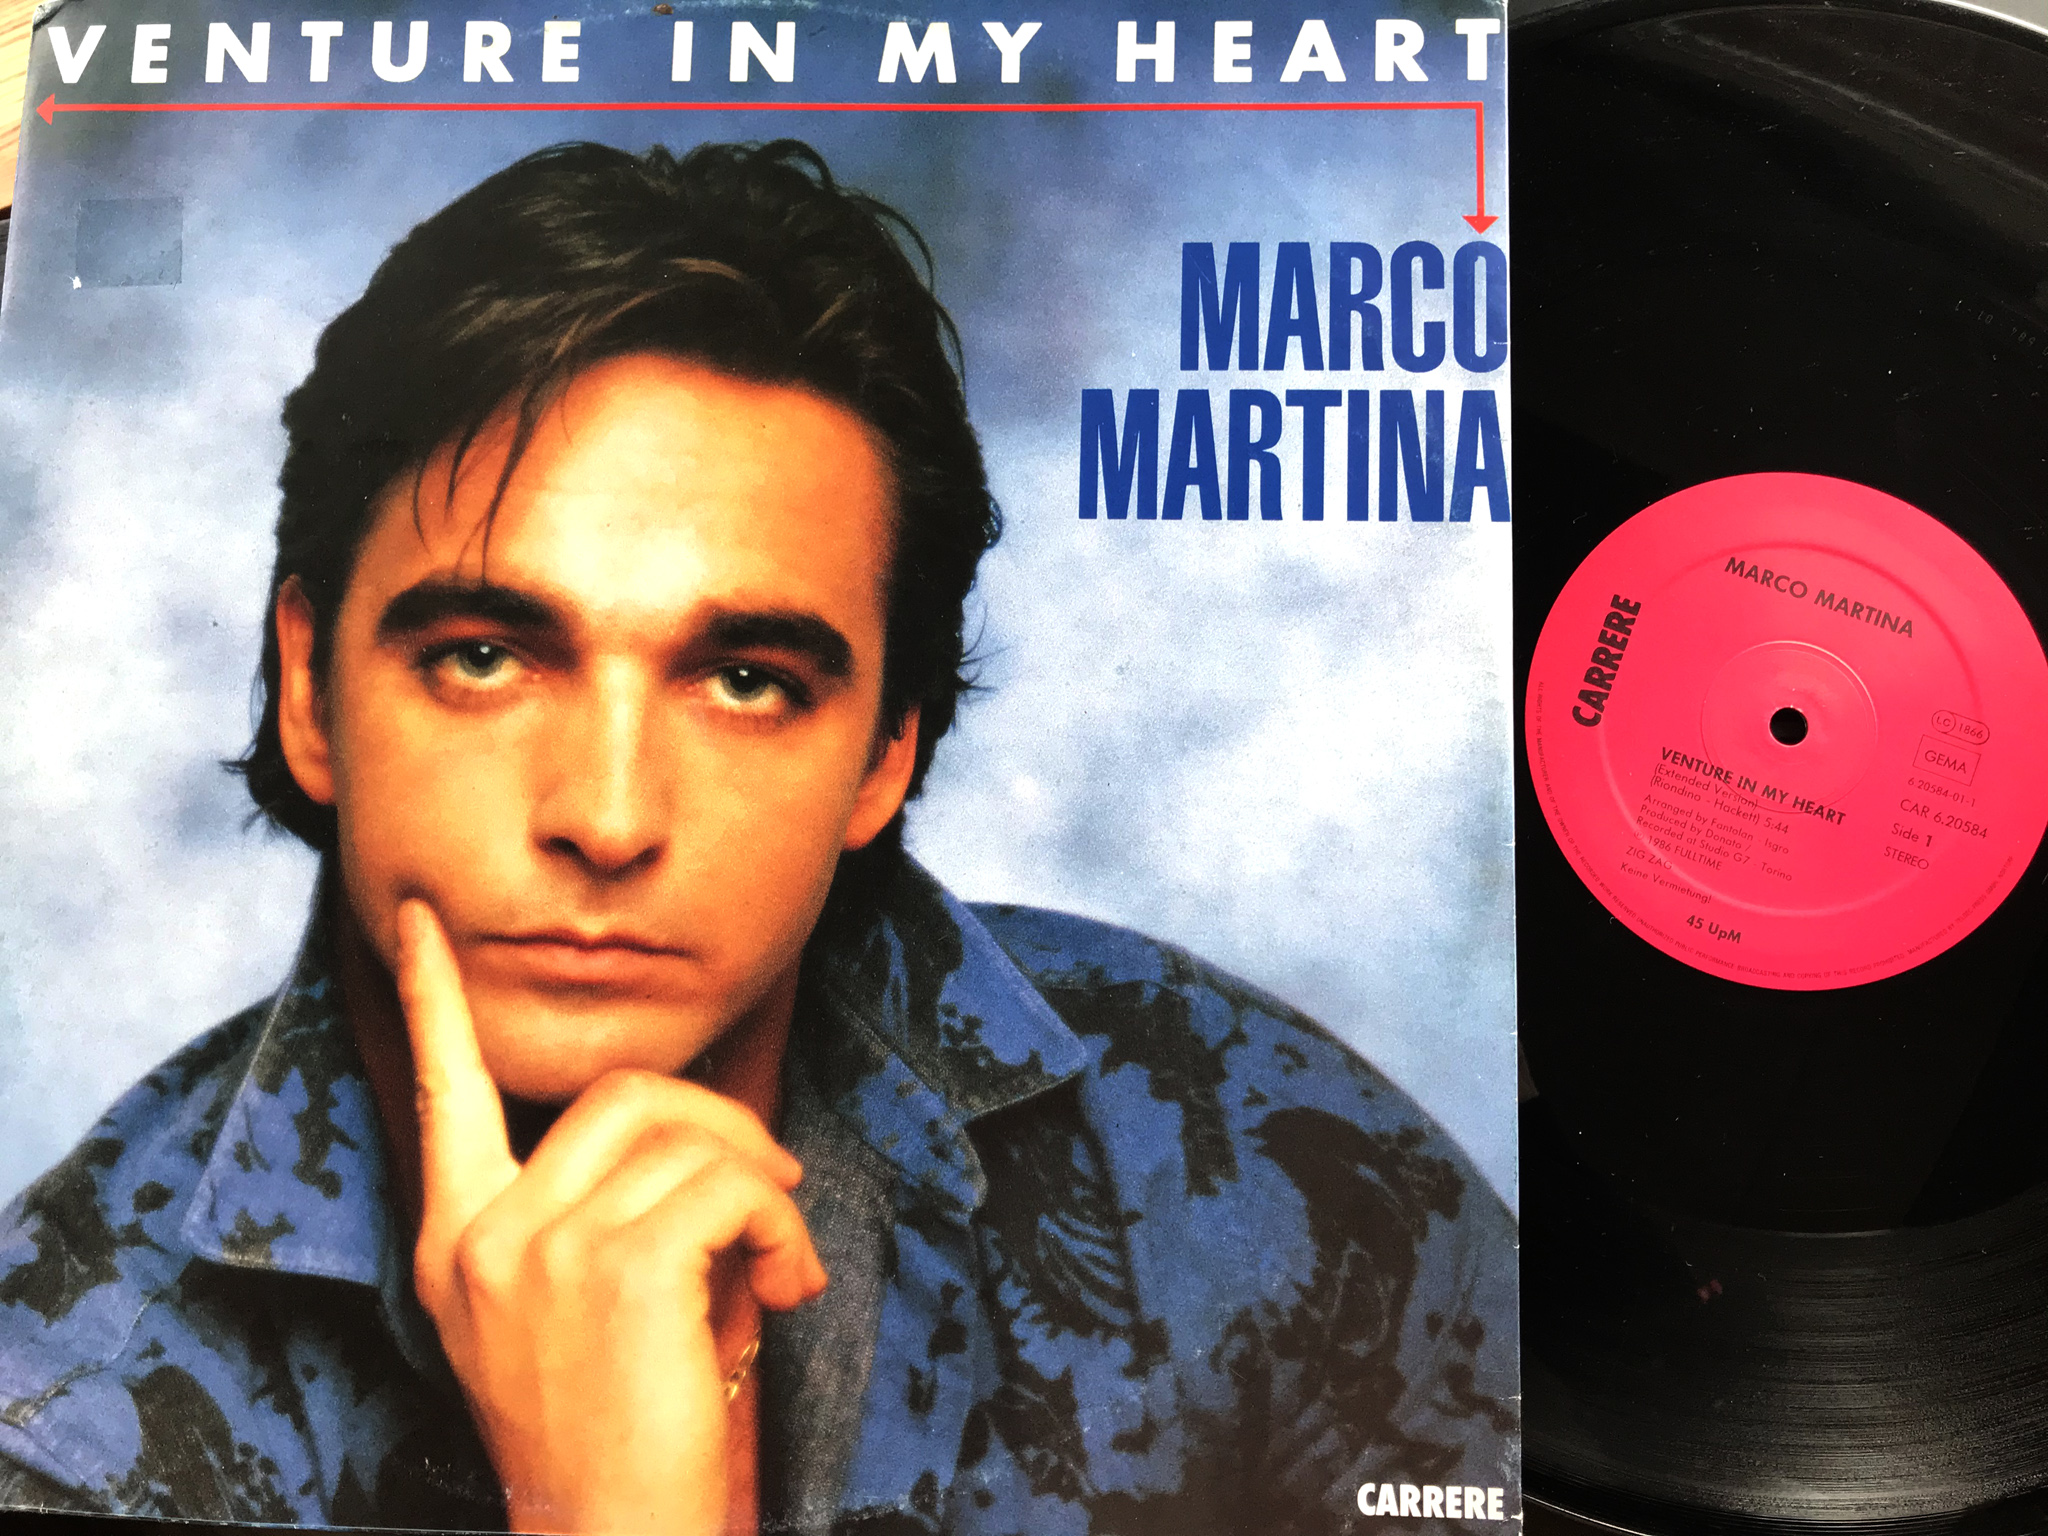 Marco Martina - Venture In My Heart